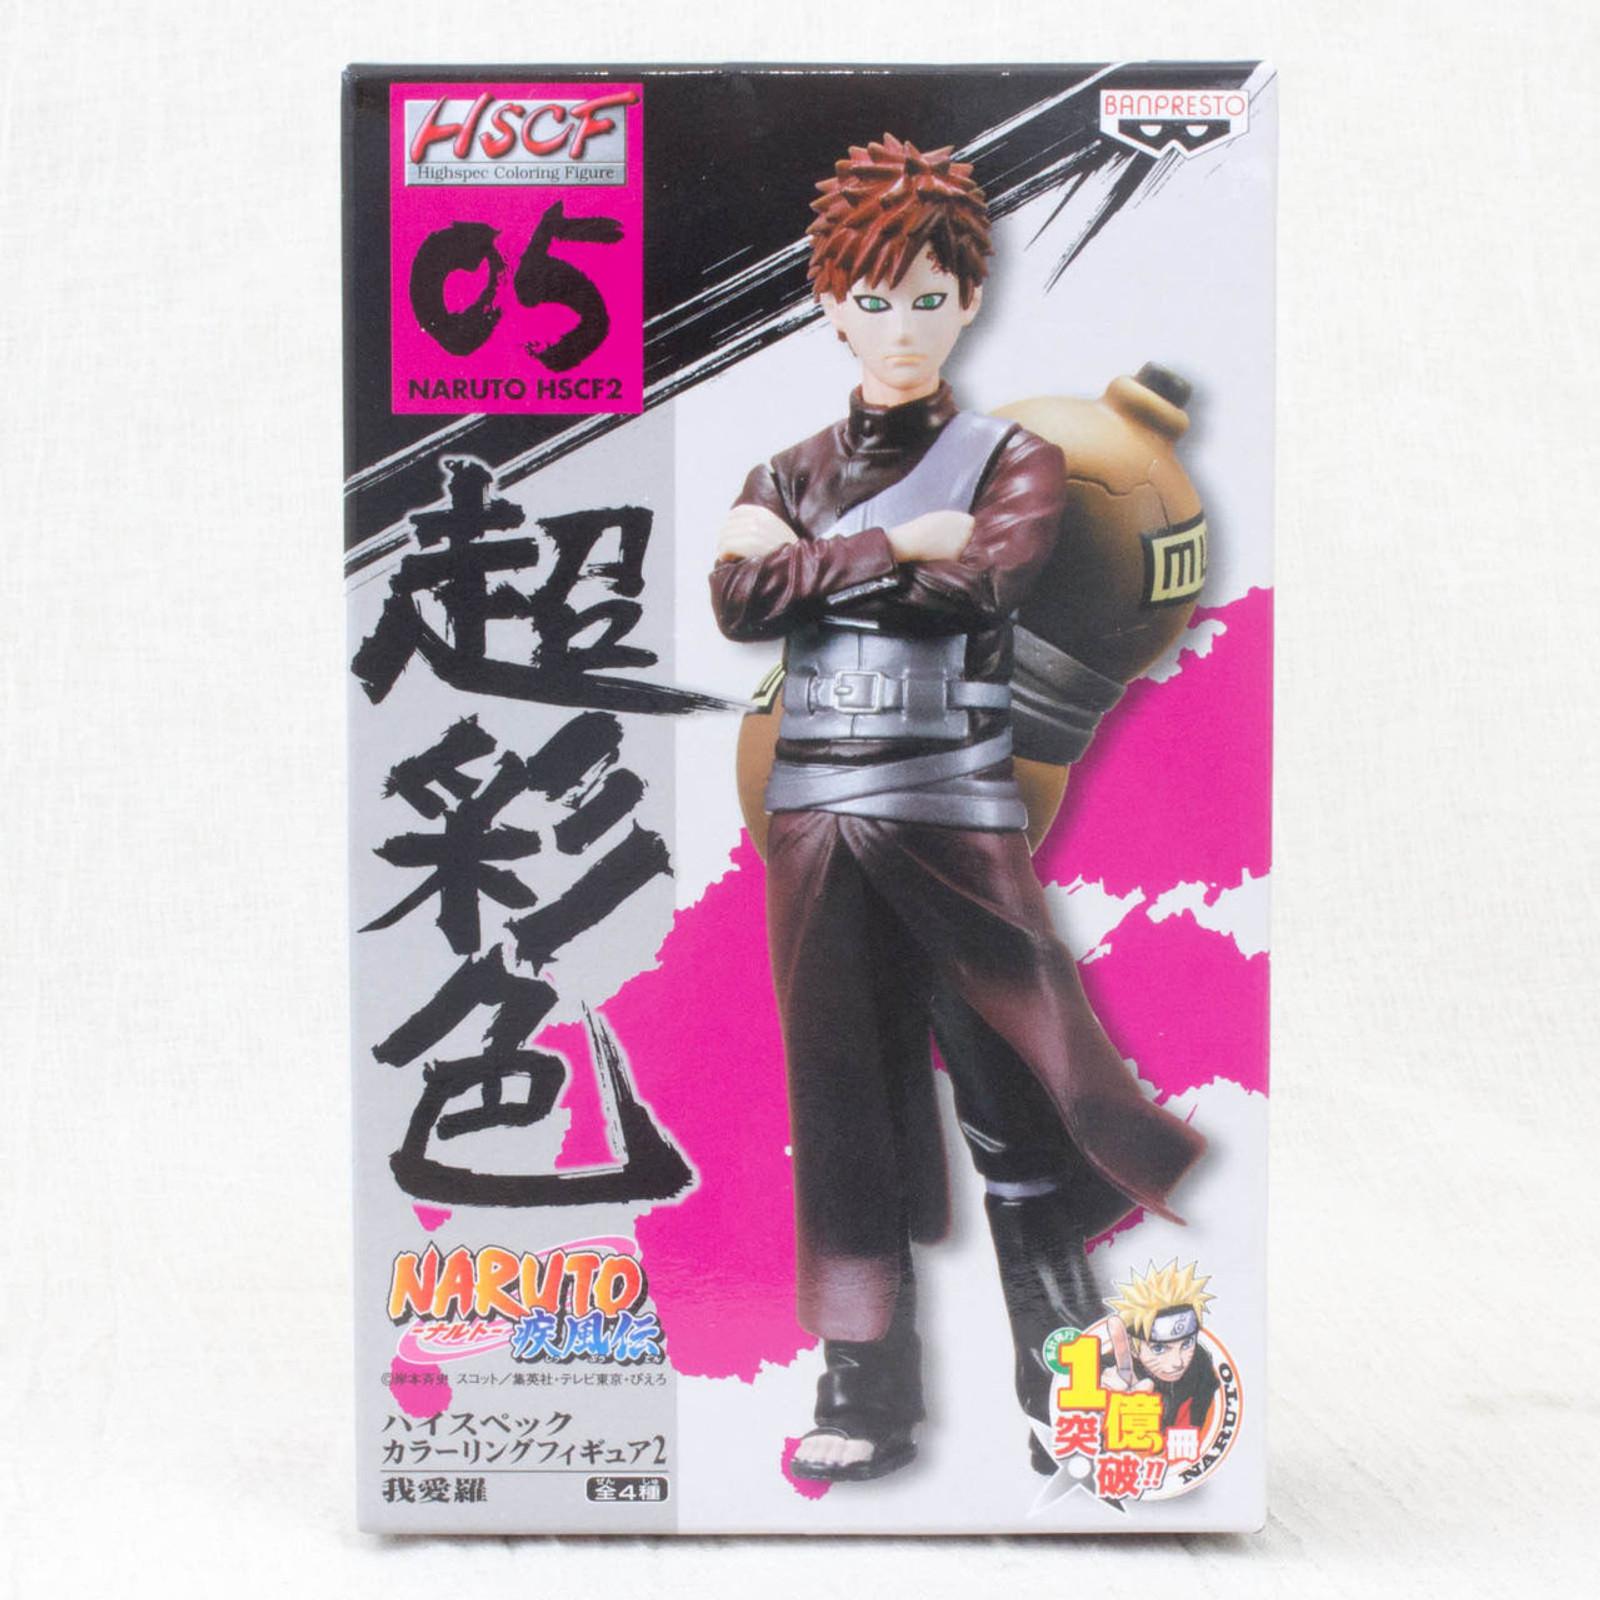 RARE! NARUTO Gaara High Spec Coloring Figure Banpresto HSCF JAPAN ANIME